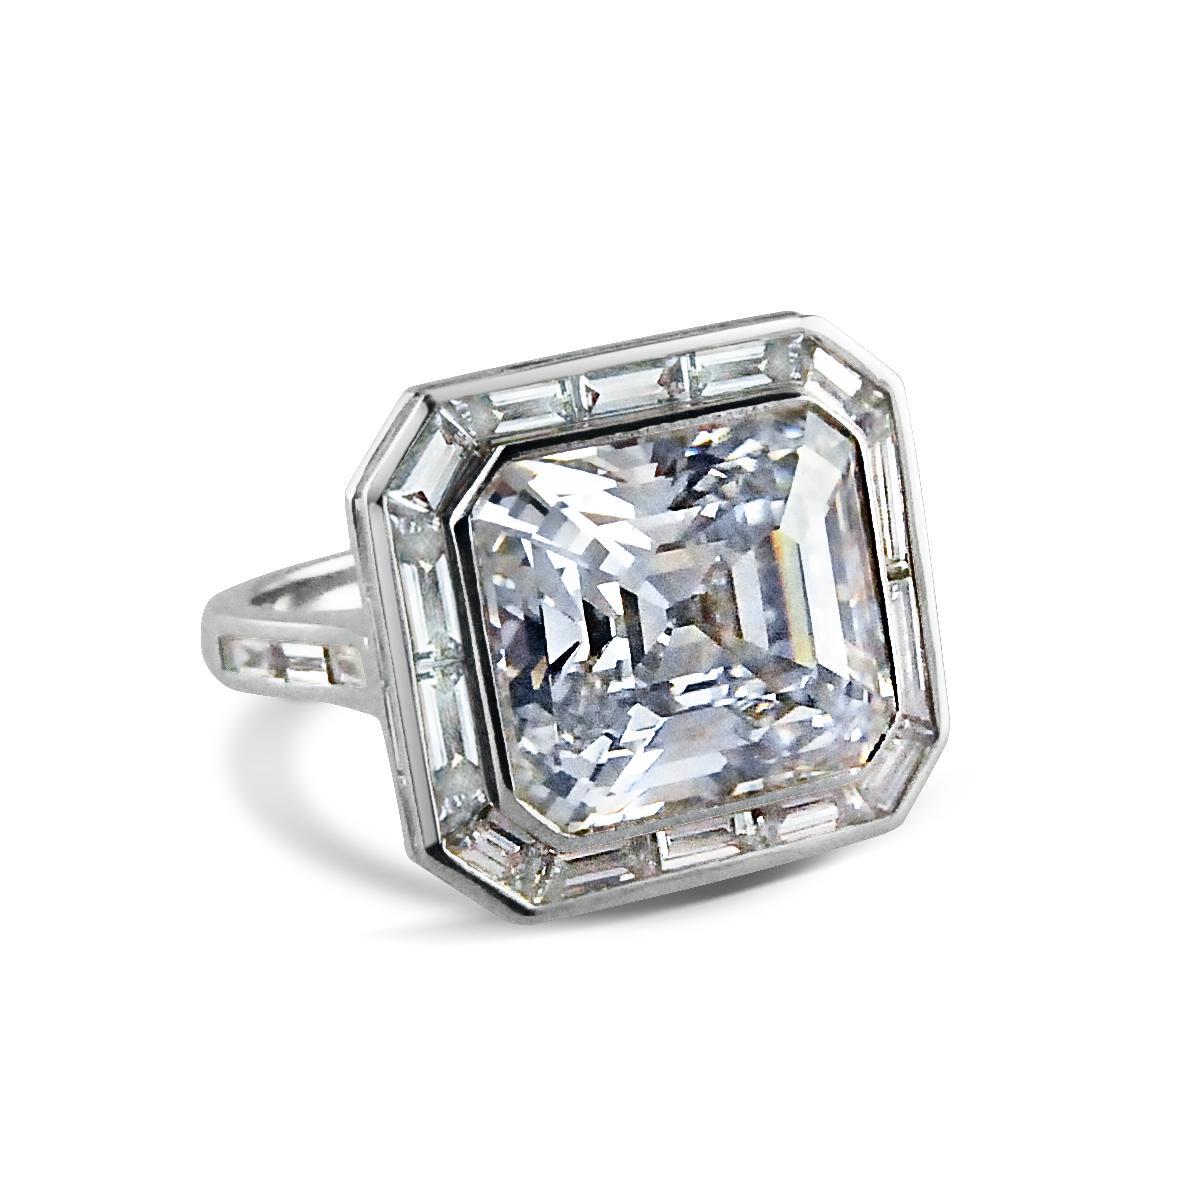 10.62ct-step-cut-diamond-and-platinum-ring.jpg